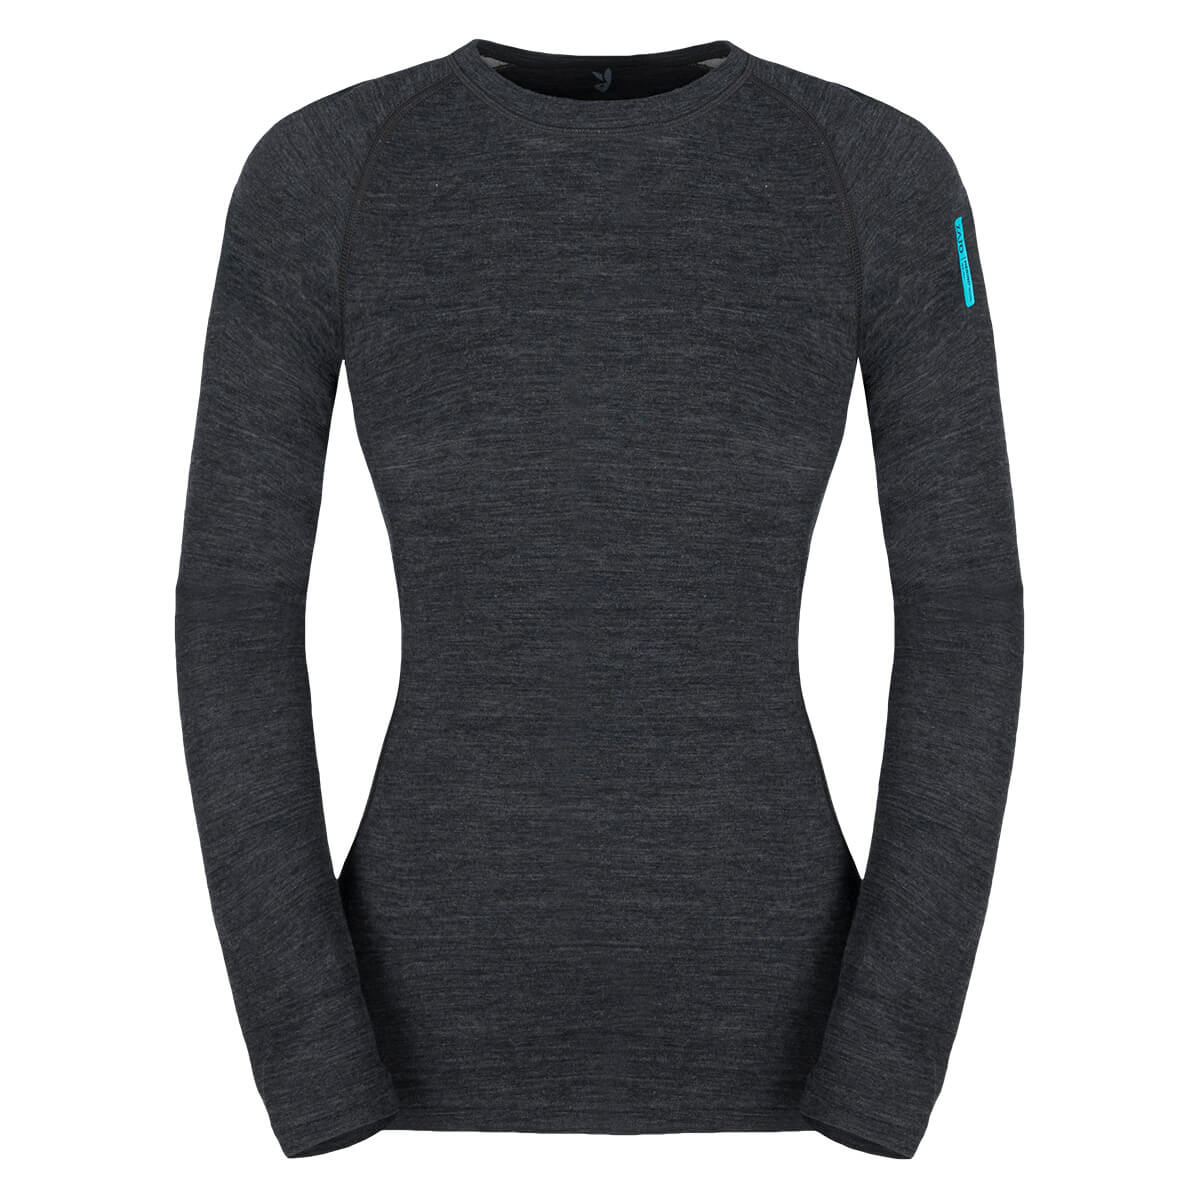 Dámske tričko Zajo Nora Merino W T-shirt LS Black - veľkosť XS